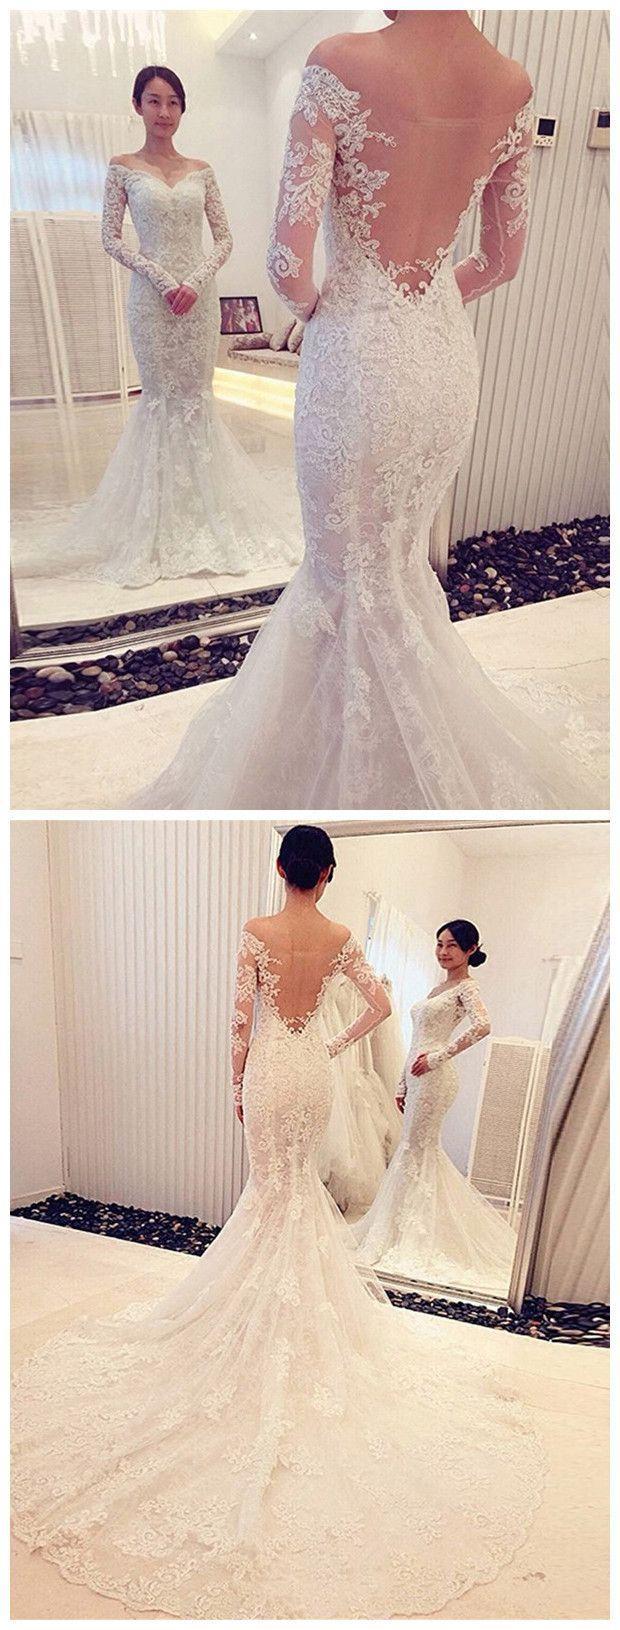 Wedding - Trumpet/Mermaid Off-the-Shoulder Long Sleeves Lace Sweep/Brush Train Wedding Dresses